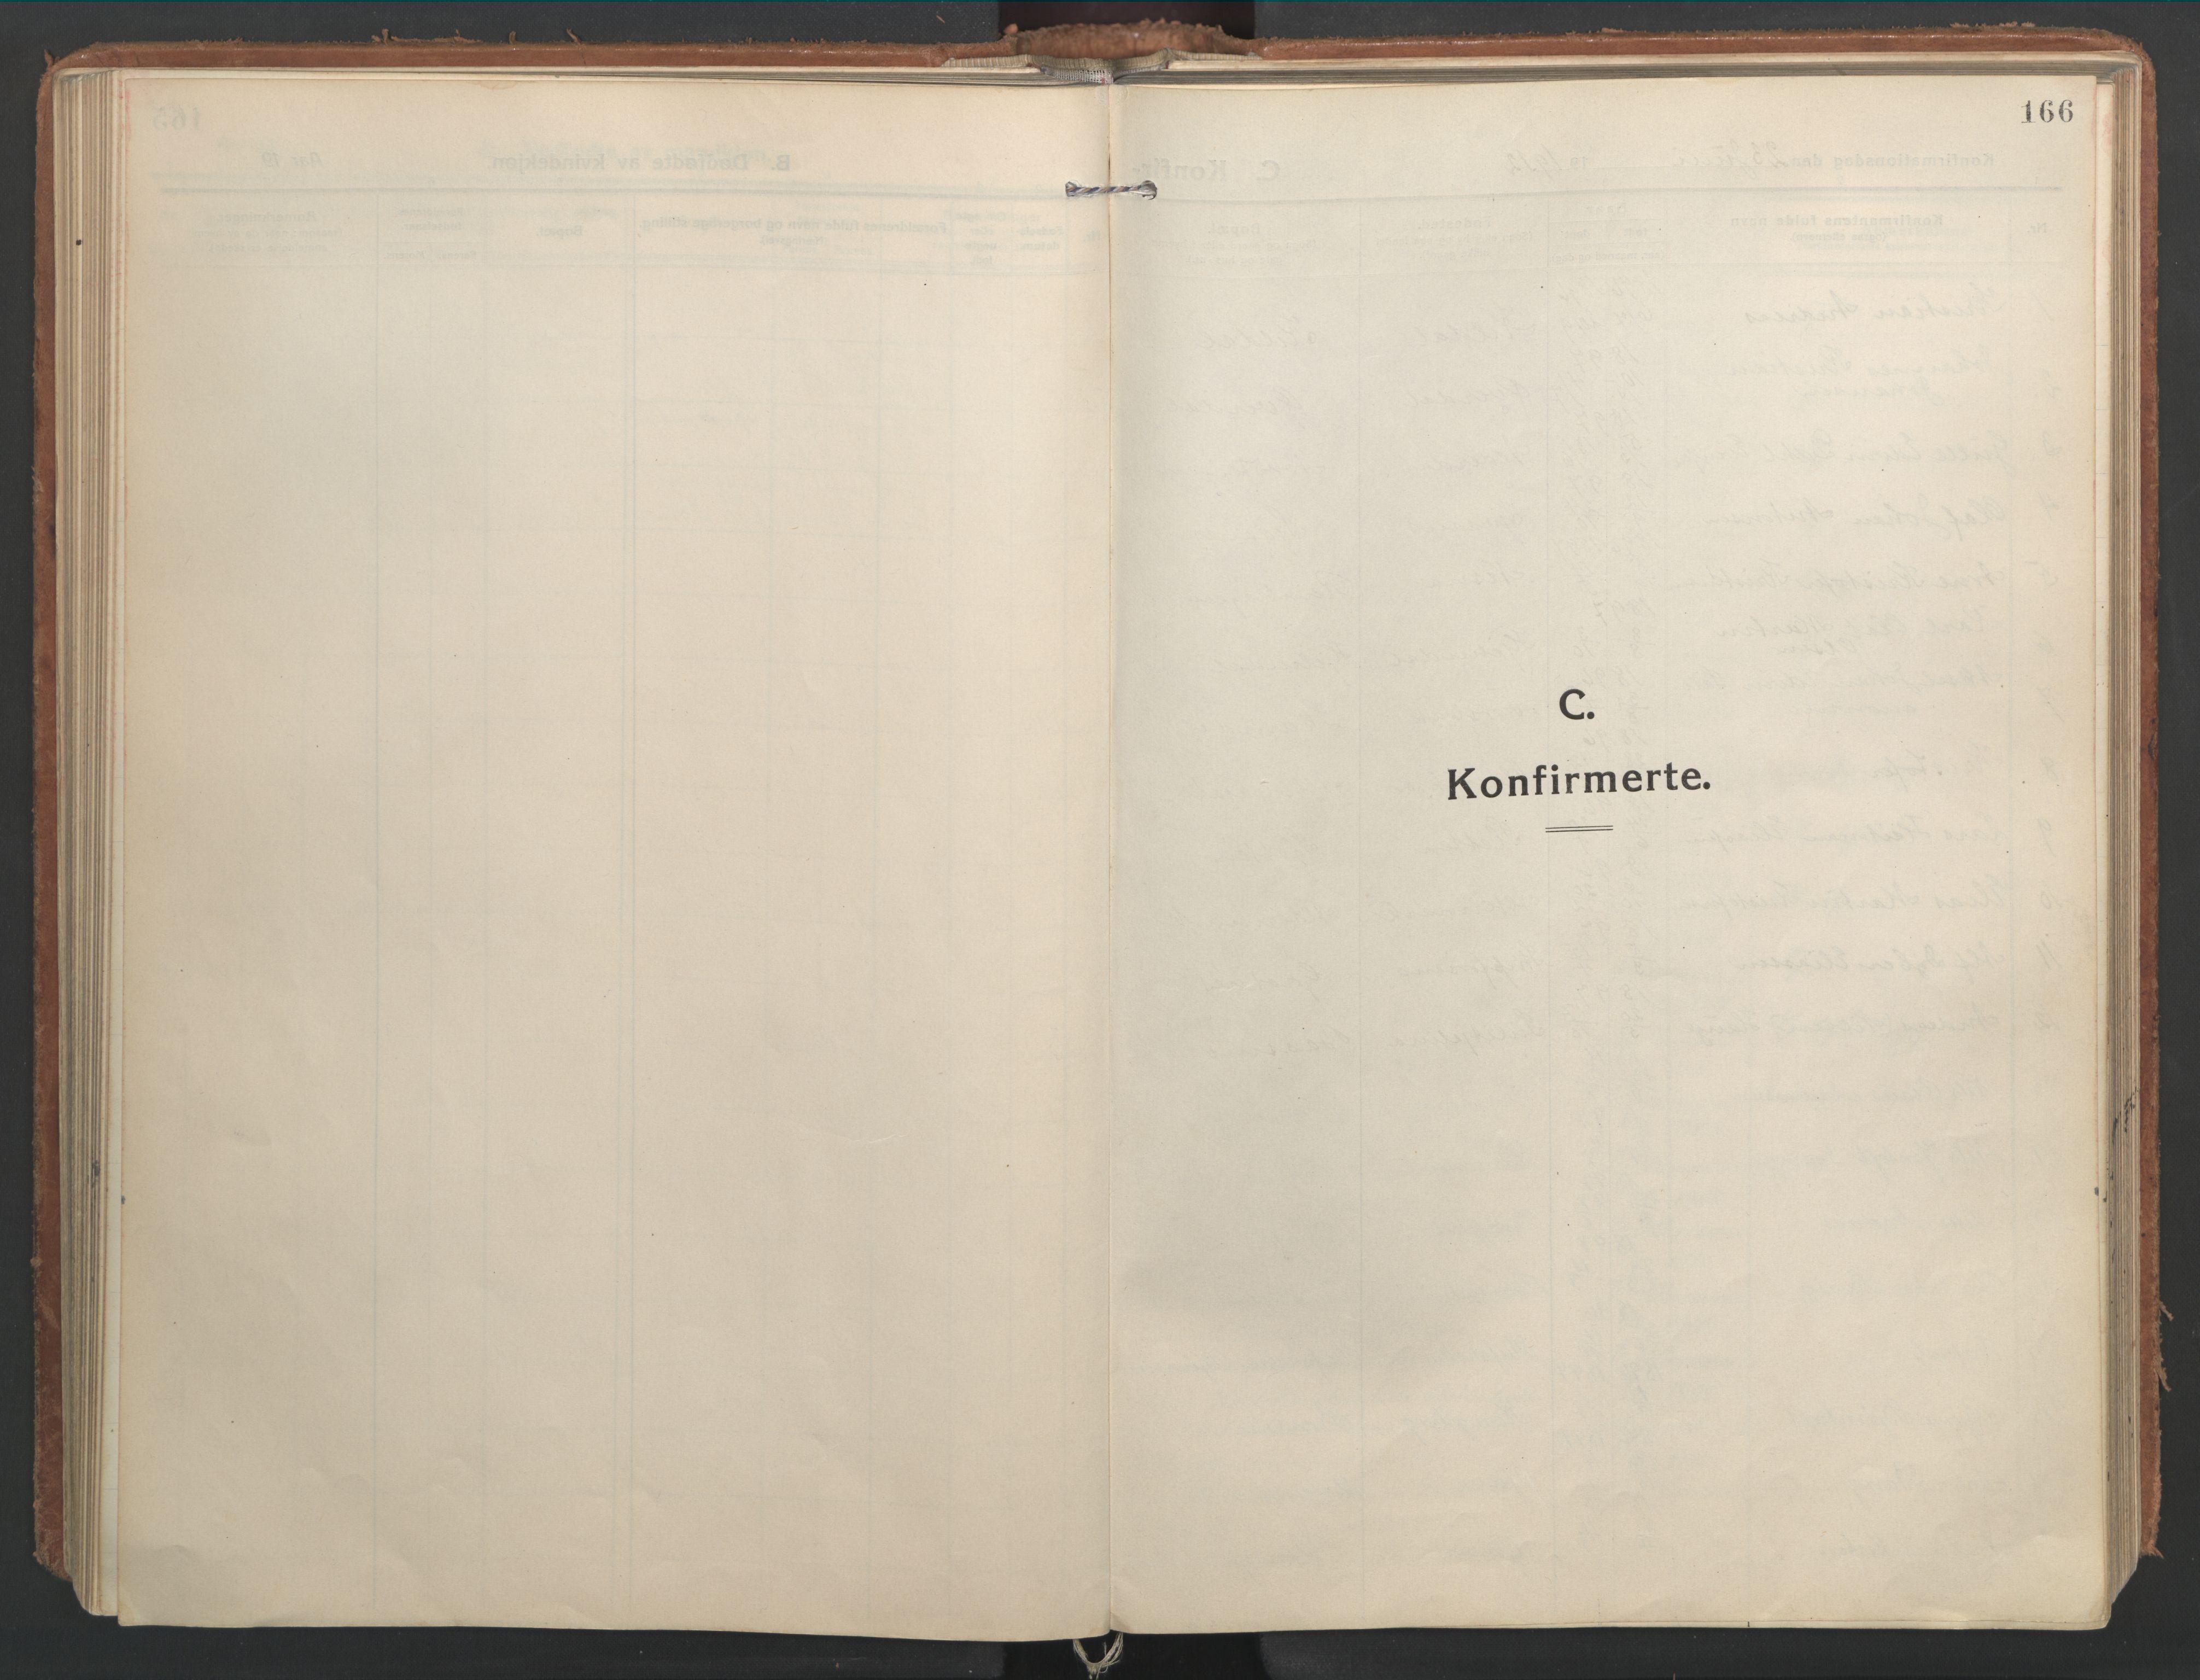 SAT, Ministerialprotokoller, klokkerbøker og fødselsregistre - Nordland, 827/L0404: Ministerialbok nr. 827A16, 1912-1925, s. 166